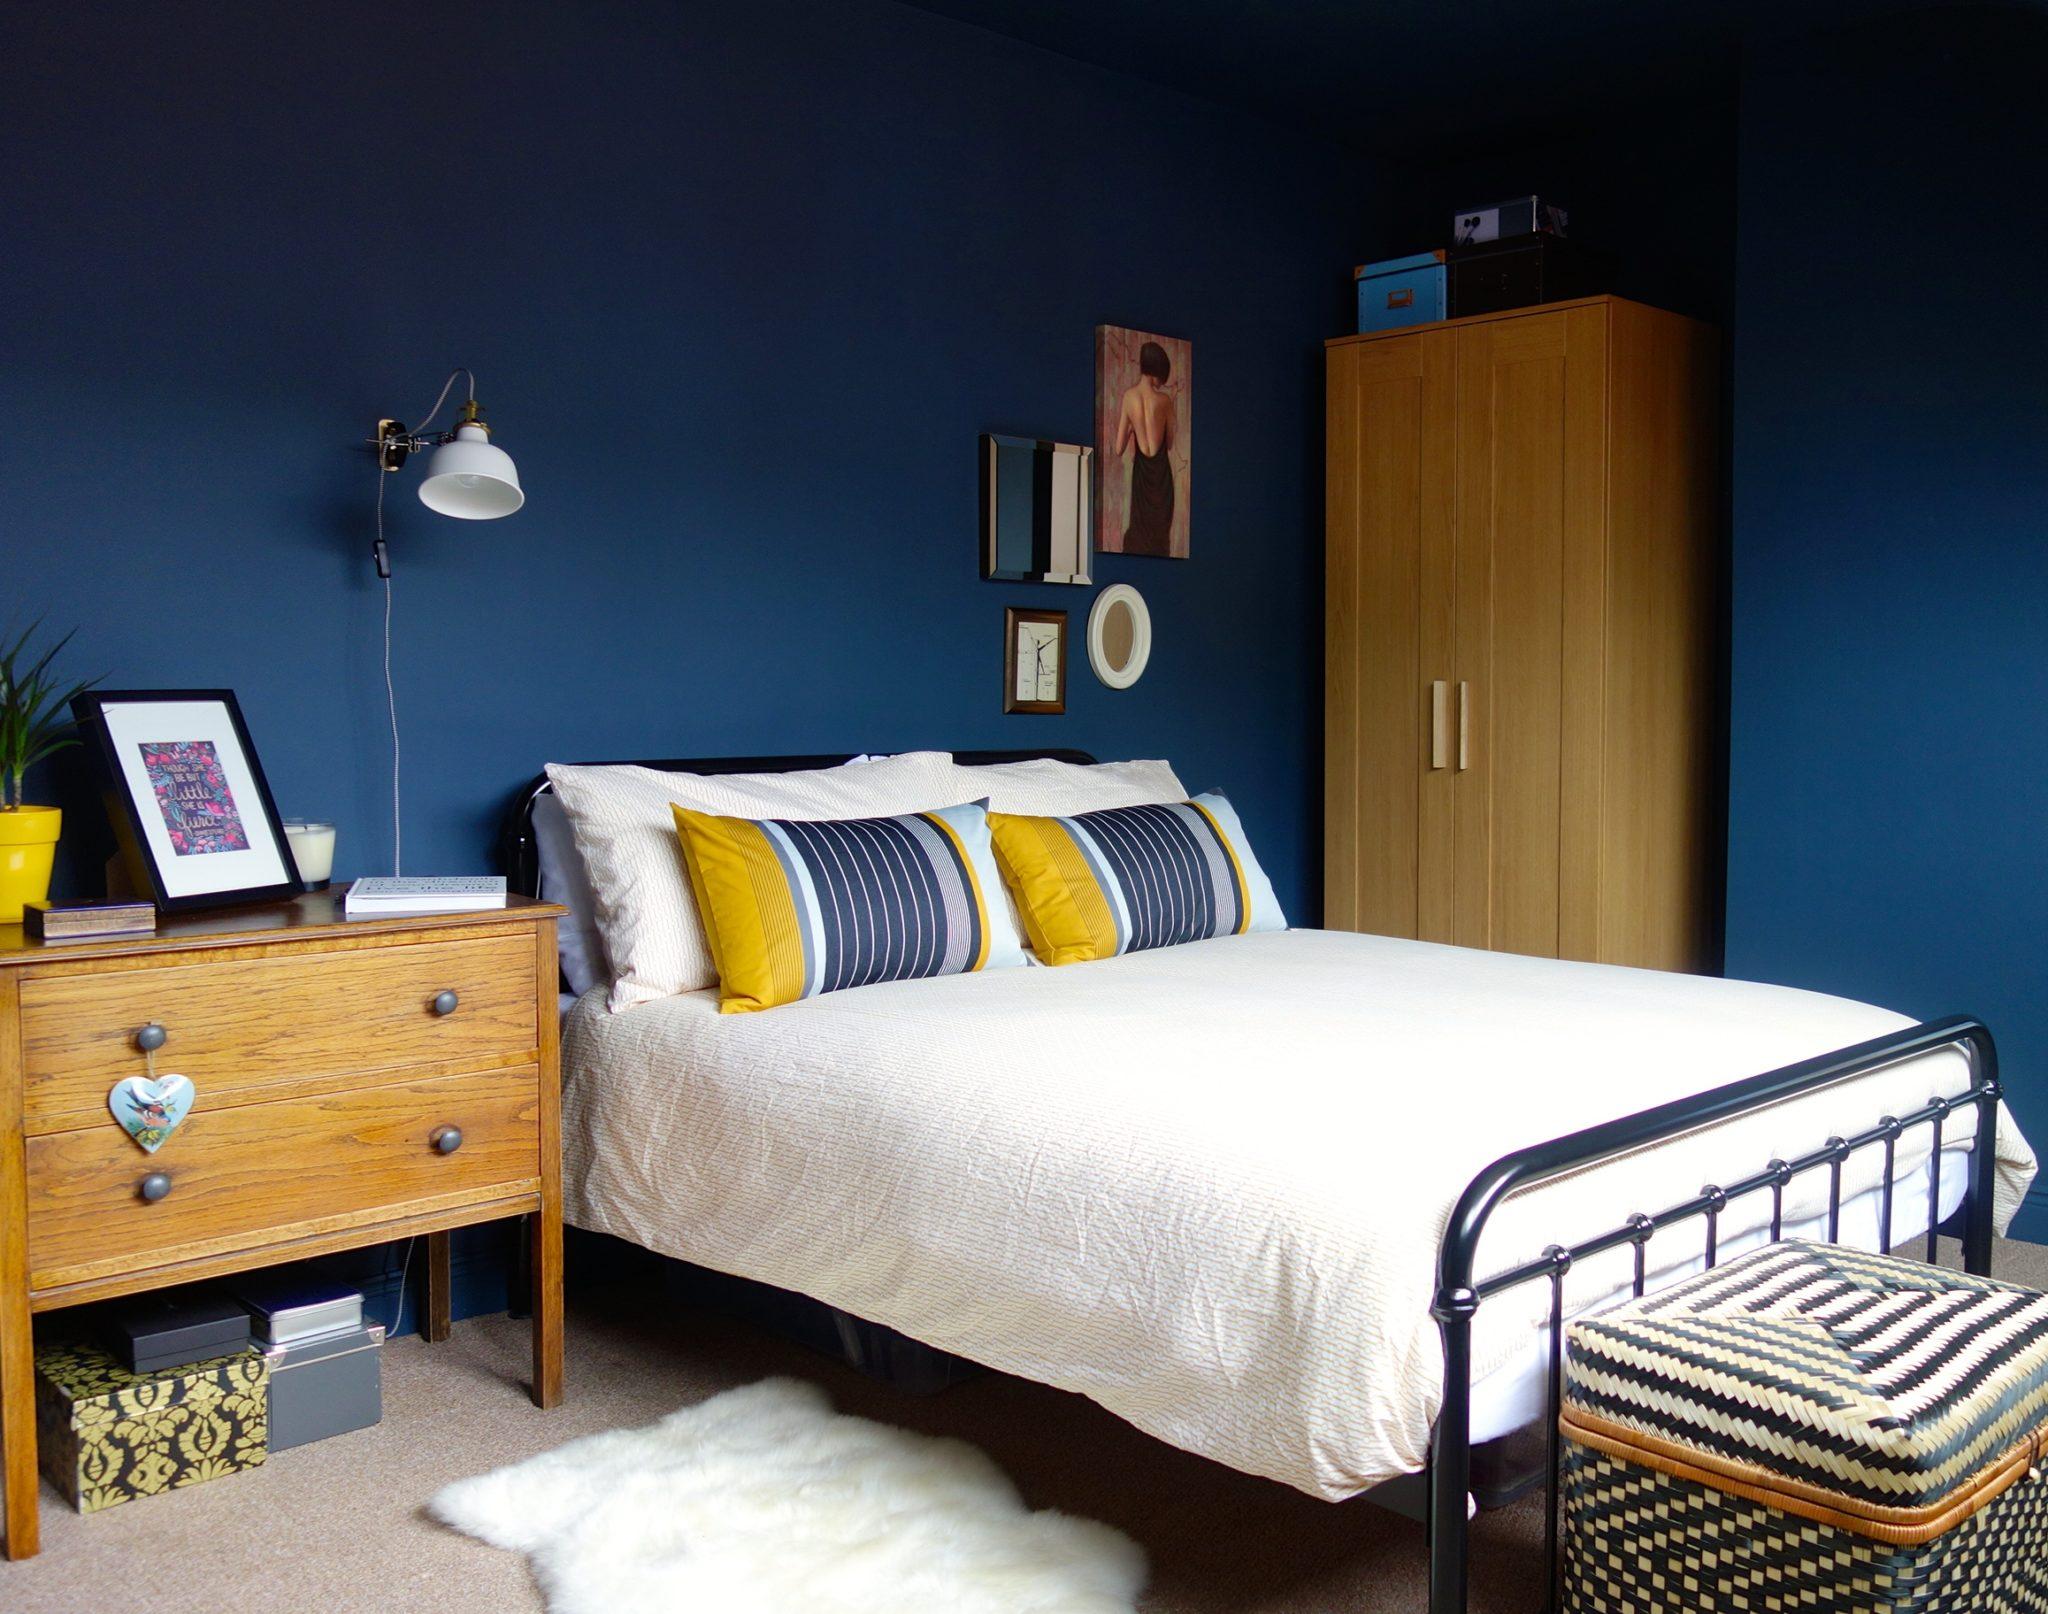 moody interior breathtaking bedrooms in shades of blue on Dark Blue Bedroom Ideas id=67459